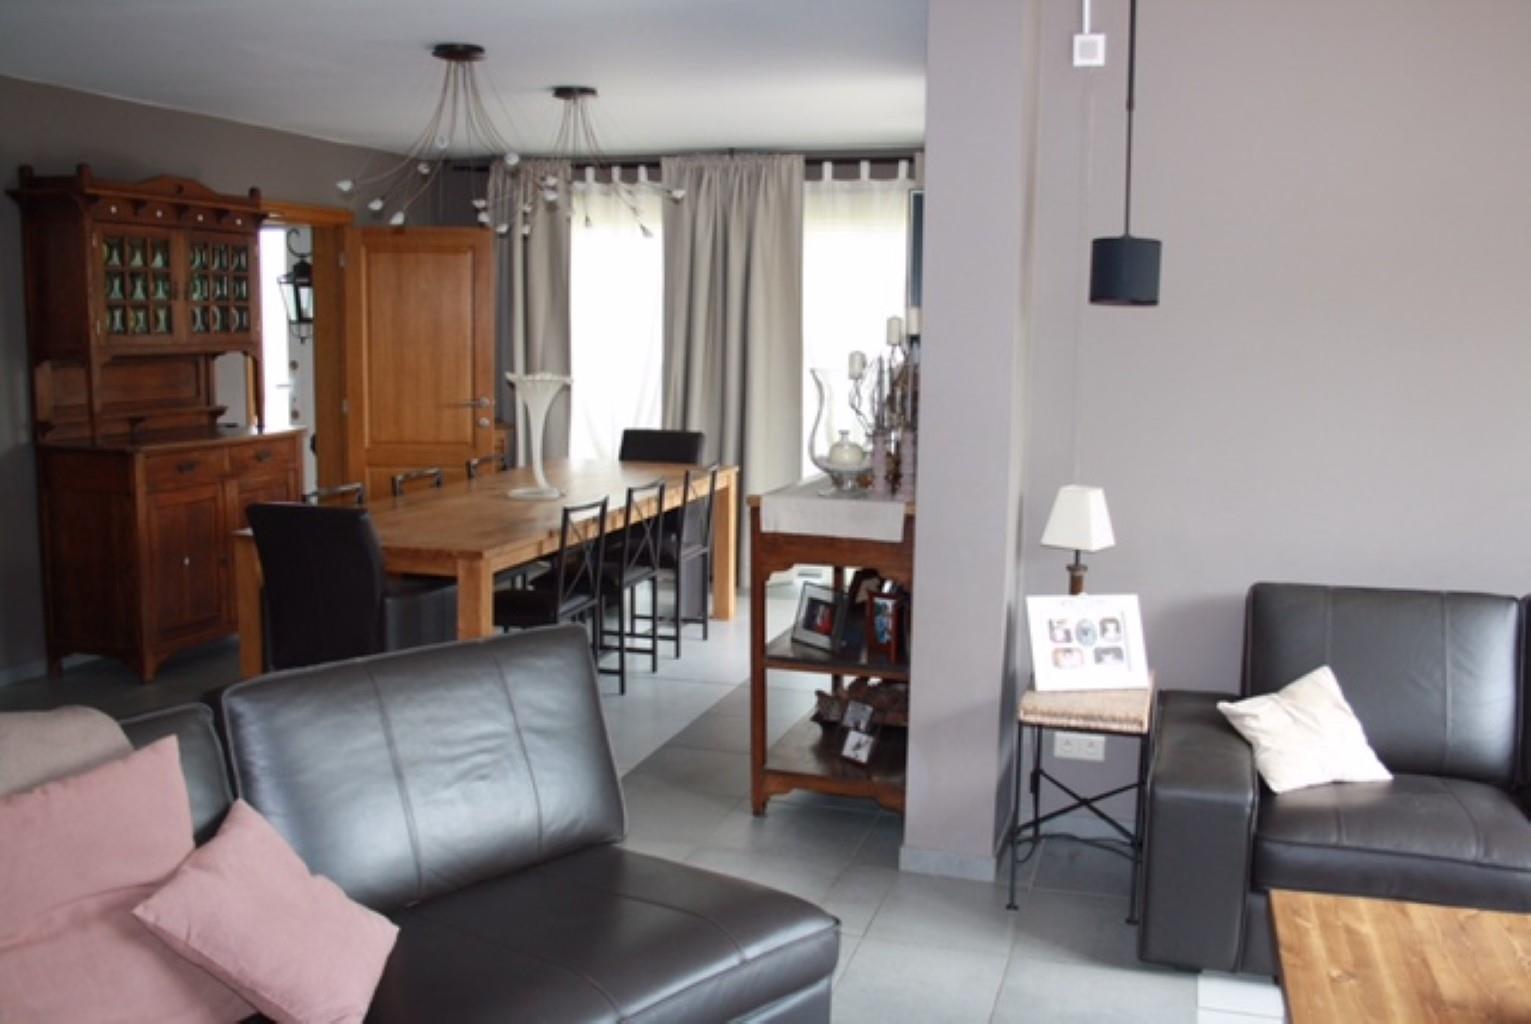 House - Villersla-Ville Tilly - #2038007-7